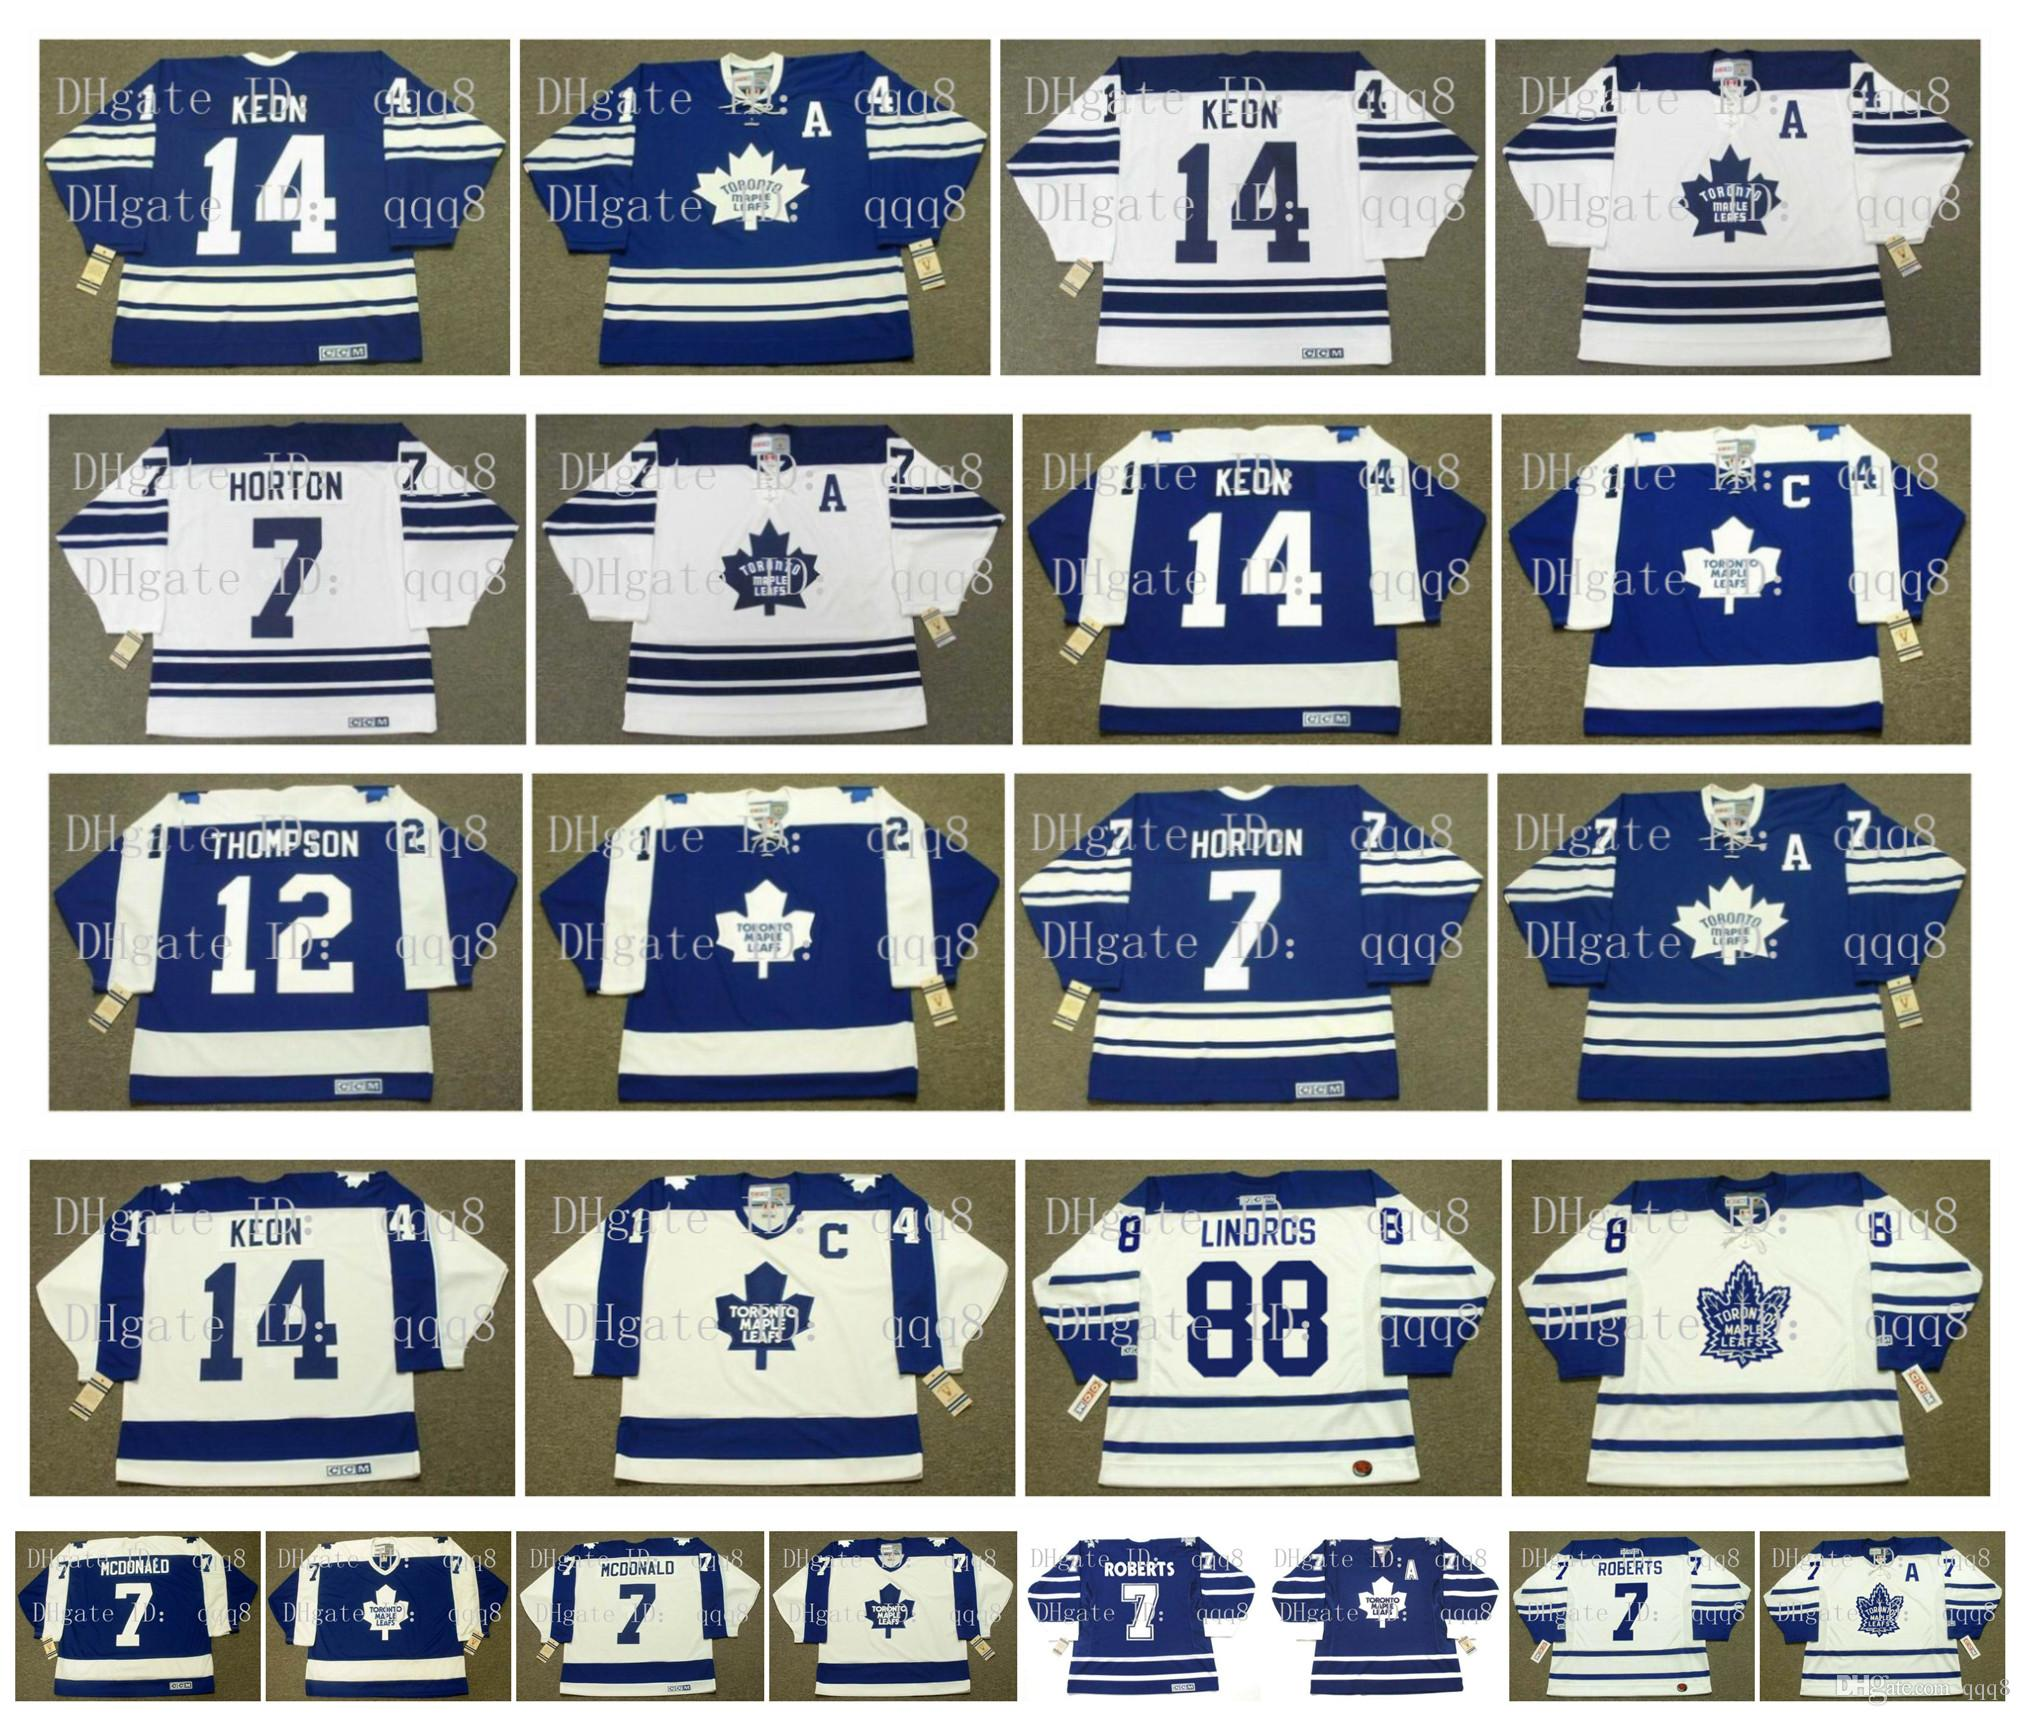 Vintage Toronto Maple Leafs Jersey 12 ERROL THOMPSON 7 TIM HORTON 14 DAVE KEON 88 ERIC LINDROS 7 LANNY MCDONALD 7 GARY ROBERTS CCM Hockey